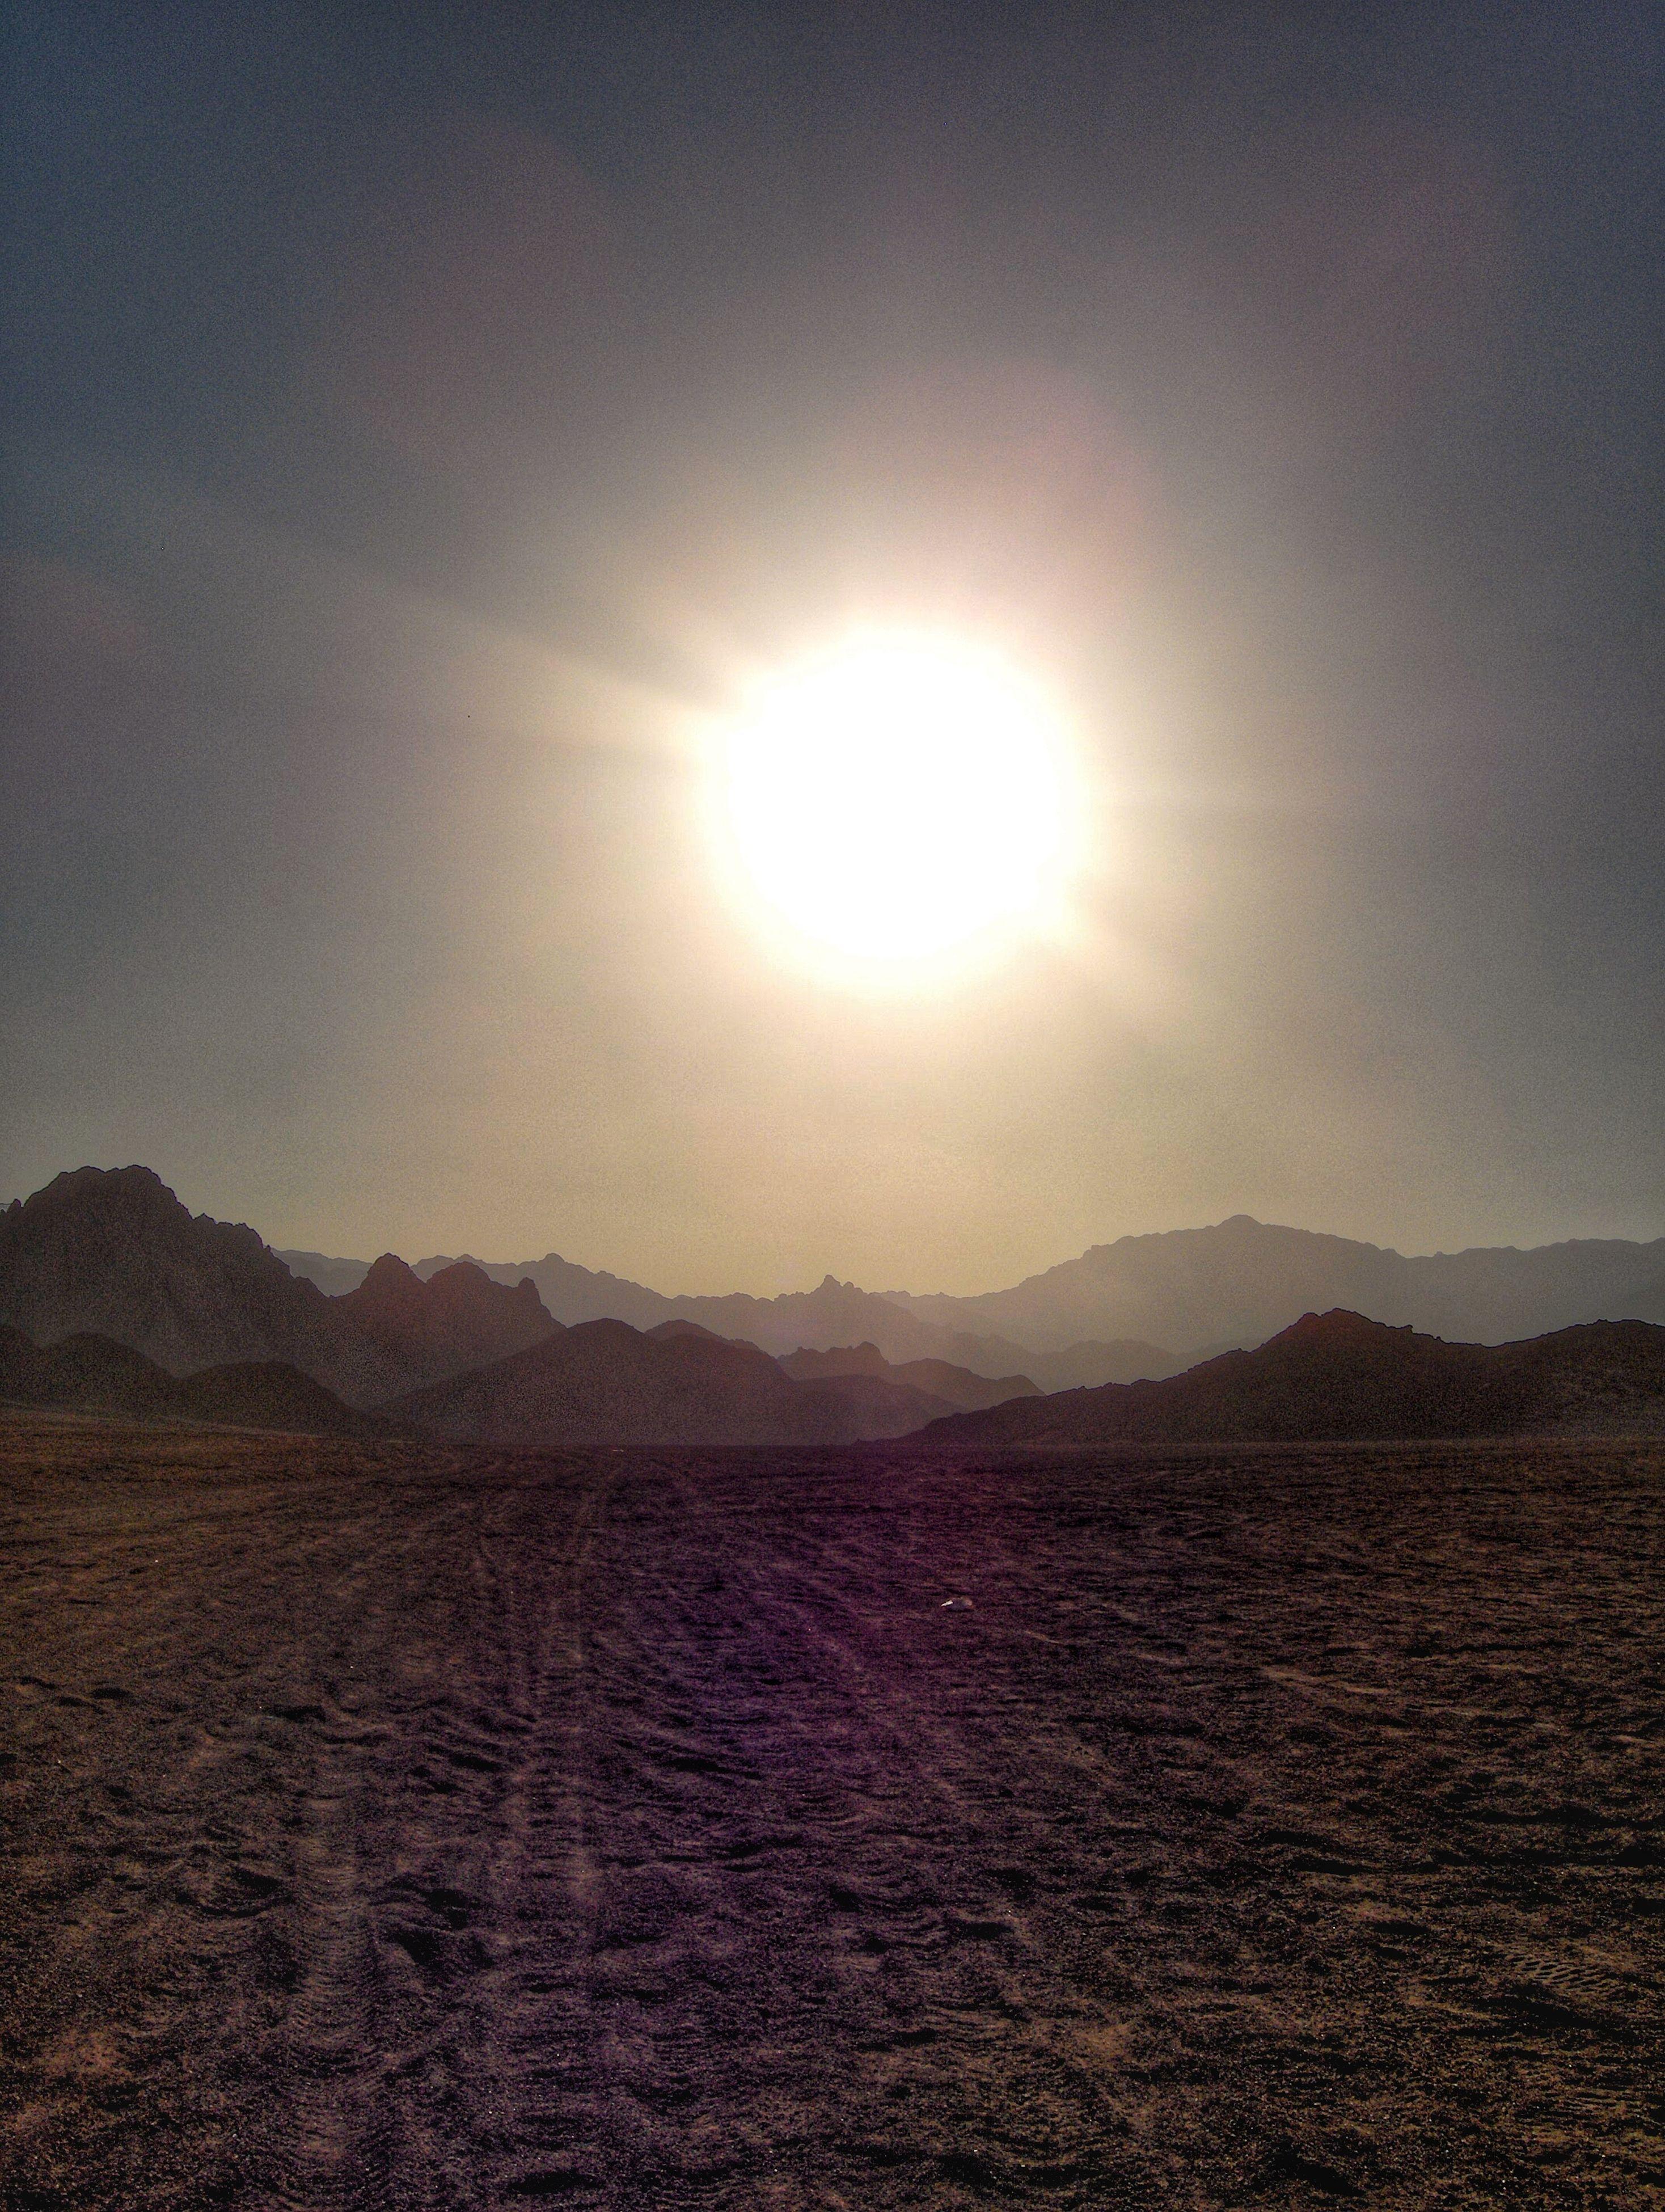 tranquil scene, tranquility, sun, mountain, scenics, beauty in nature, landscape, sky, sunlight, nature, sunbeam, mountain range, non-urban scene, lens flare, idyllic, remote, sand, outdoors, desert, no people